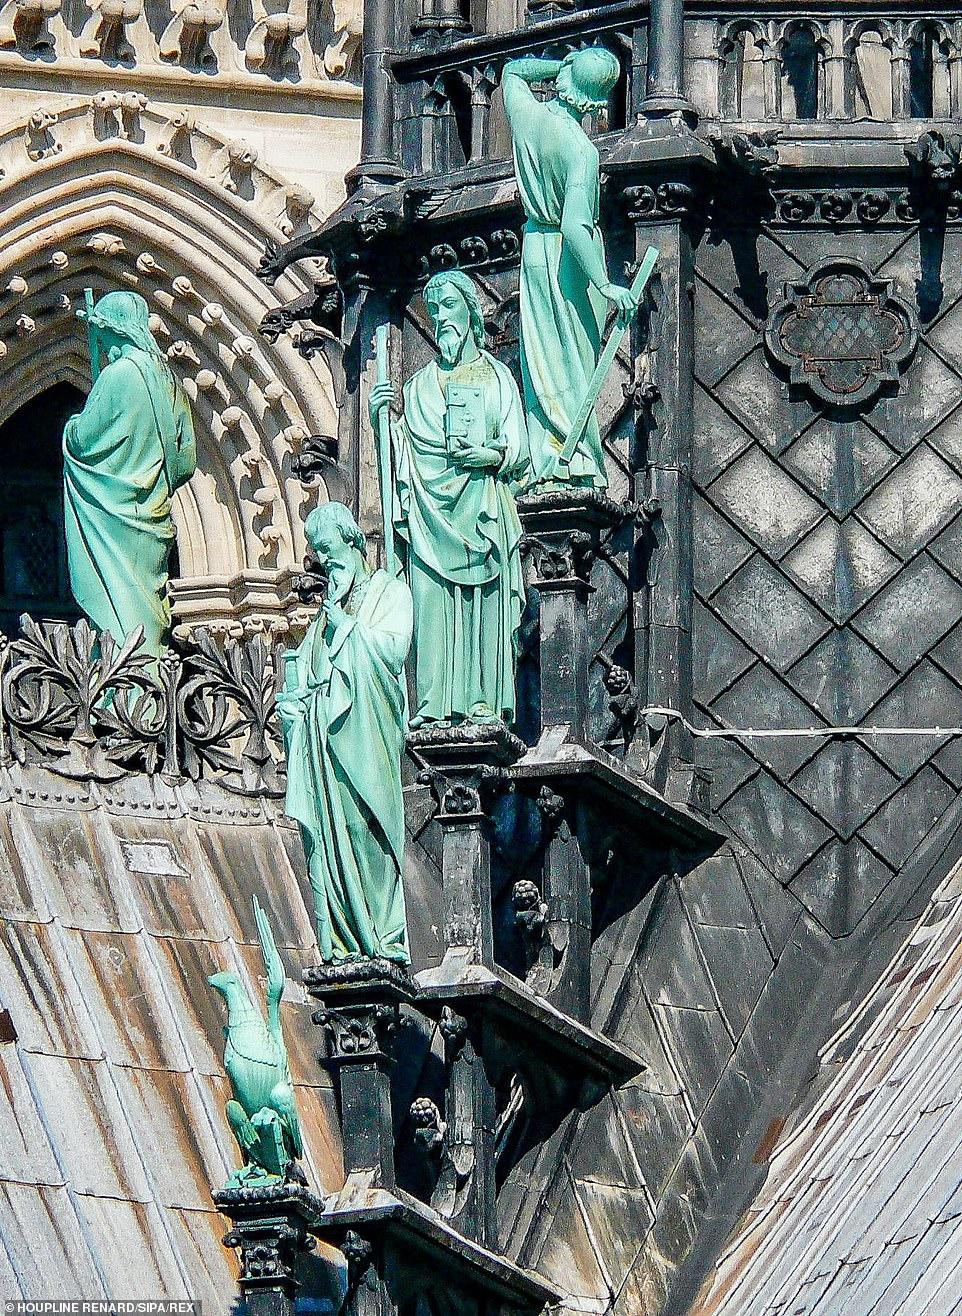 16 statutes Notre Dame